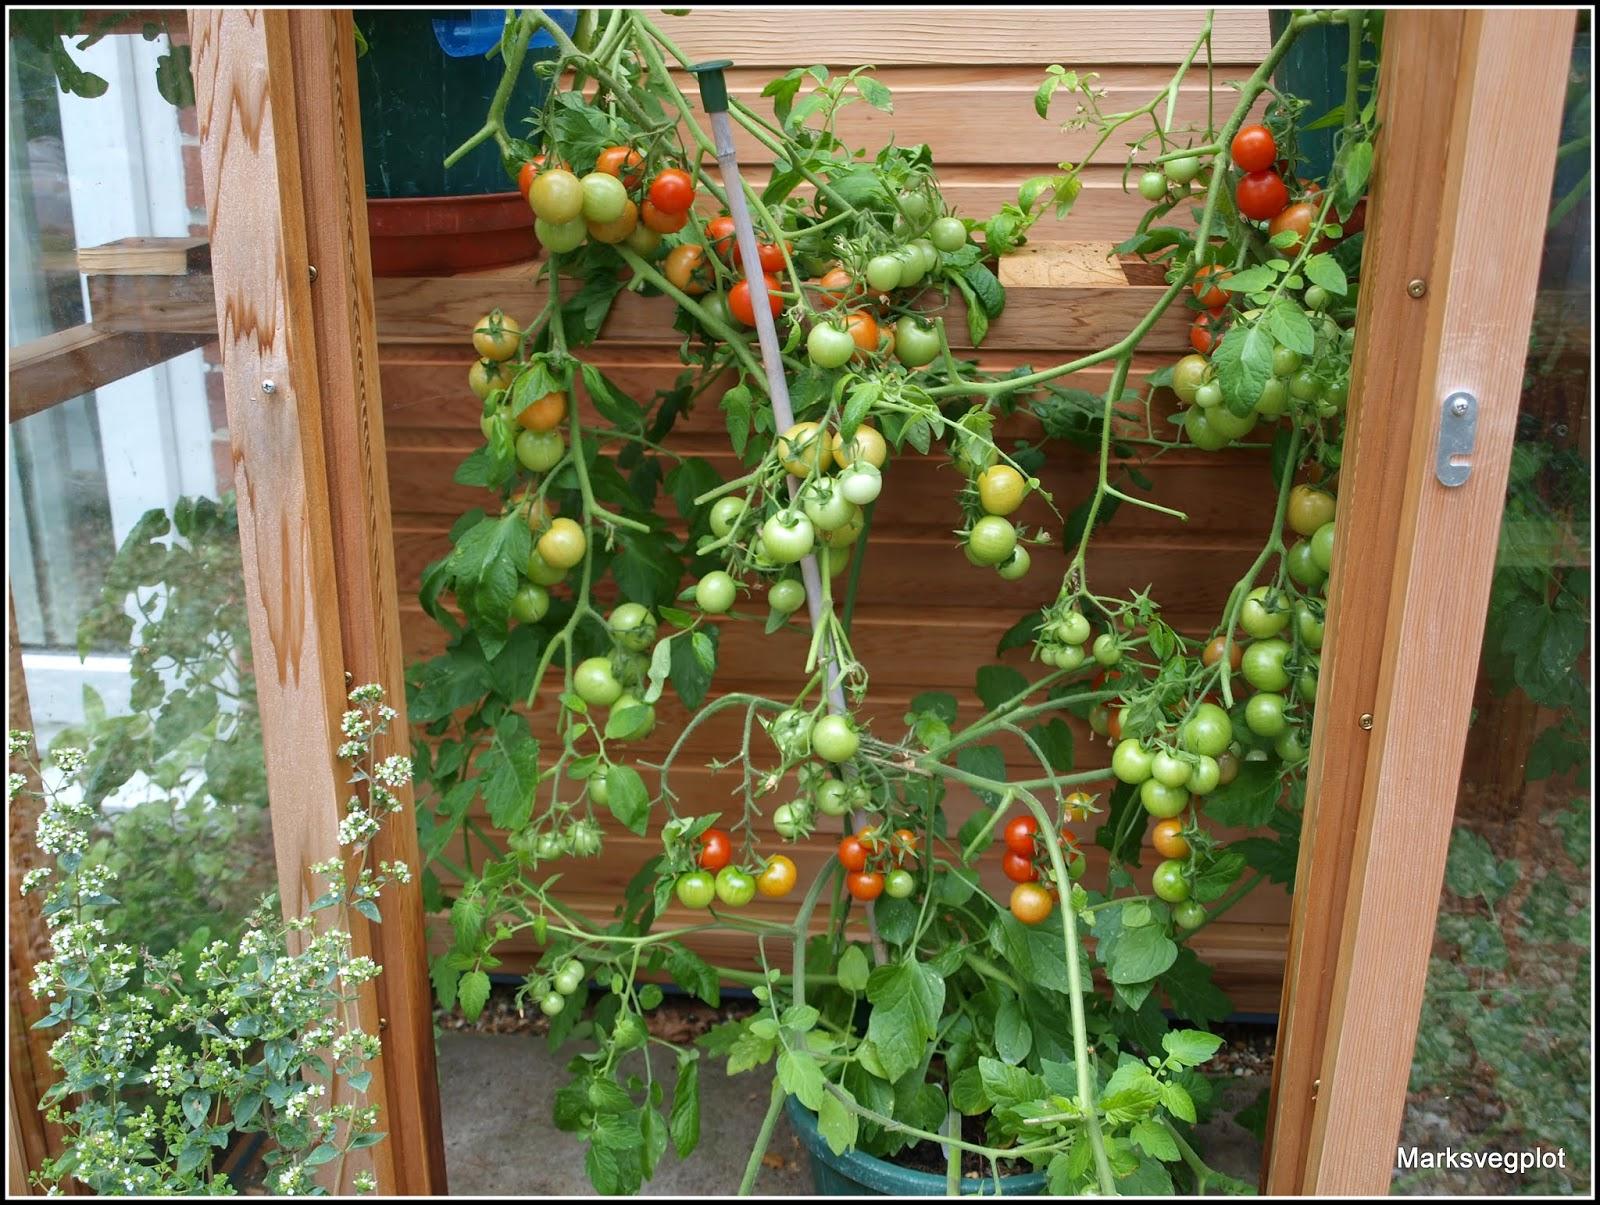 Mark\'s Veg Plot: Tomato update